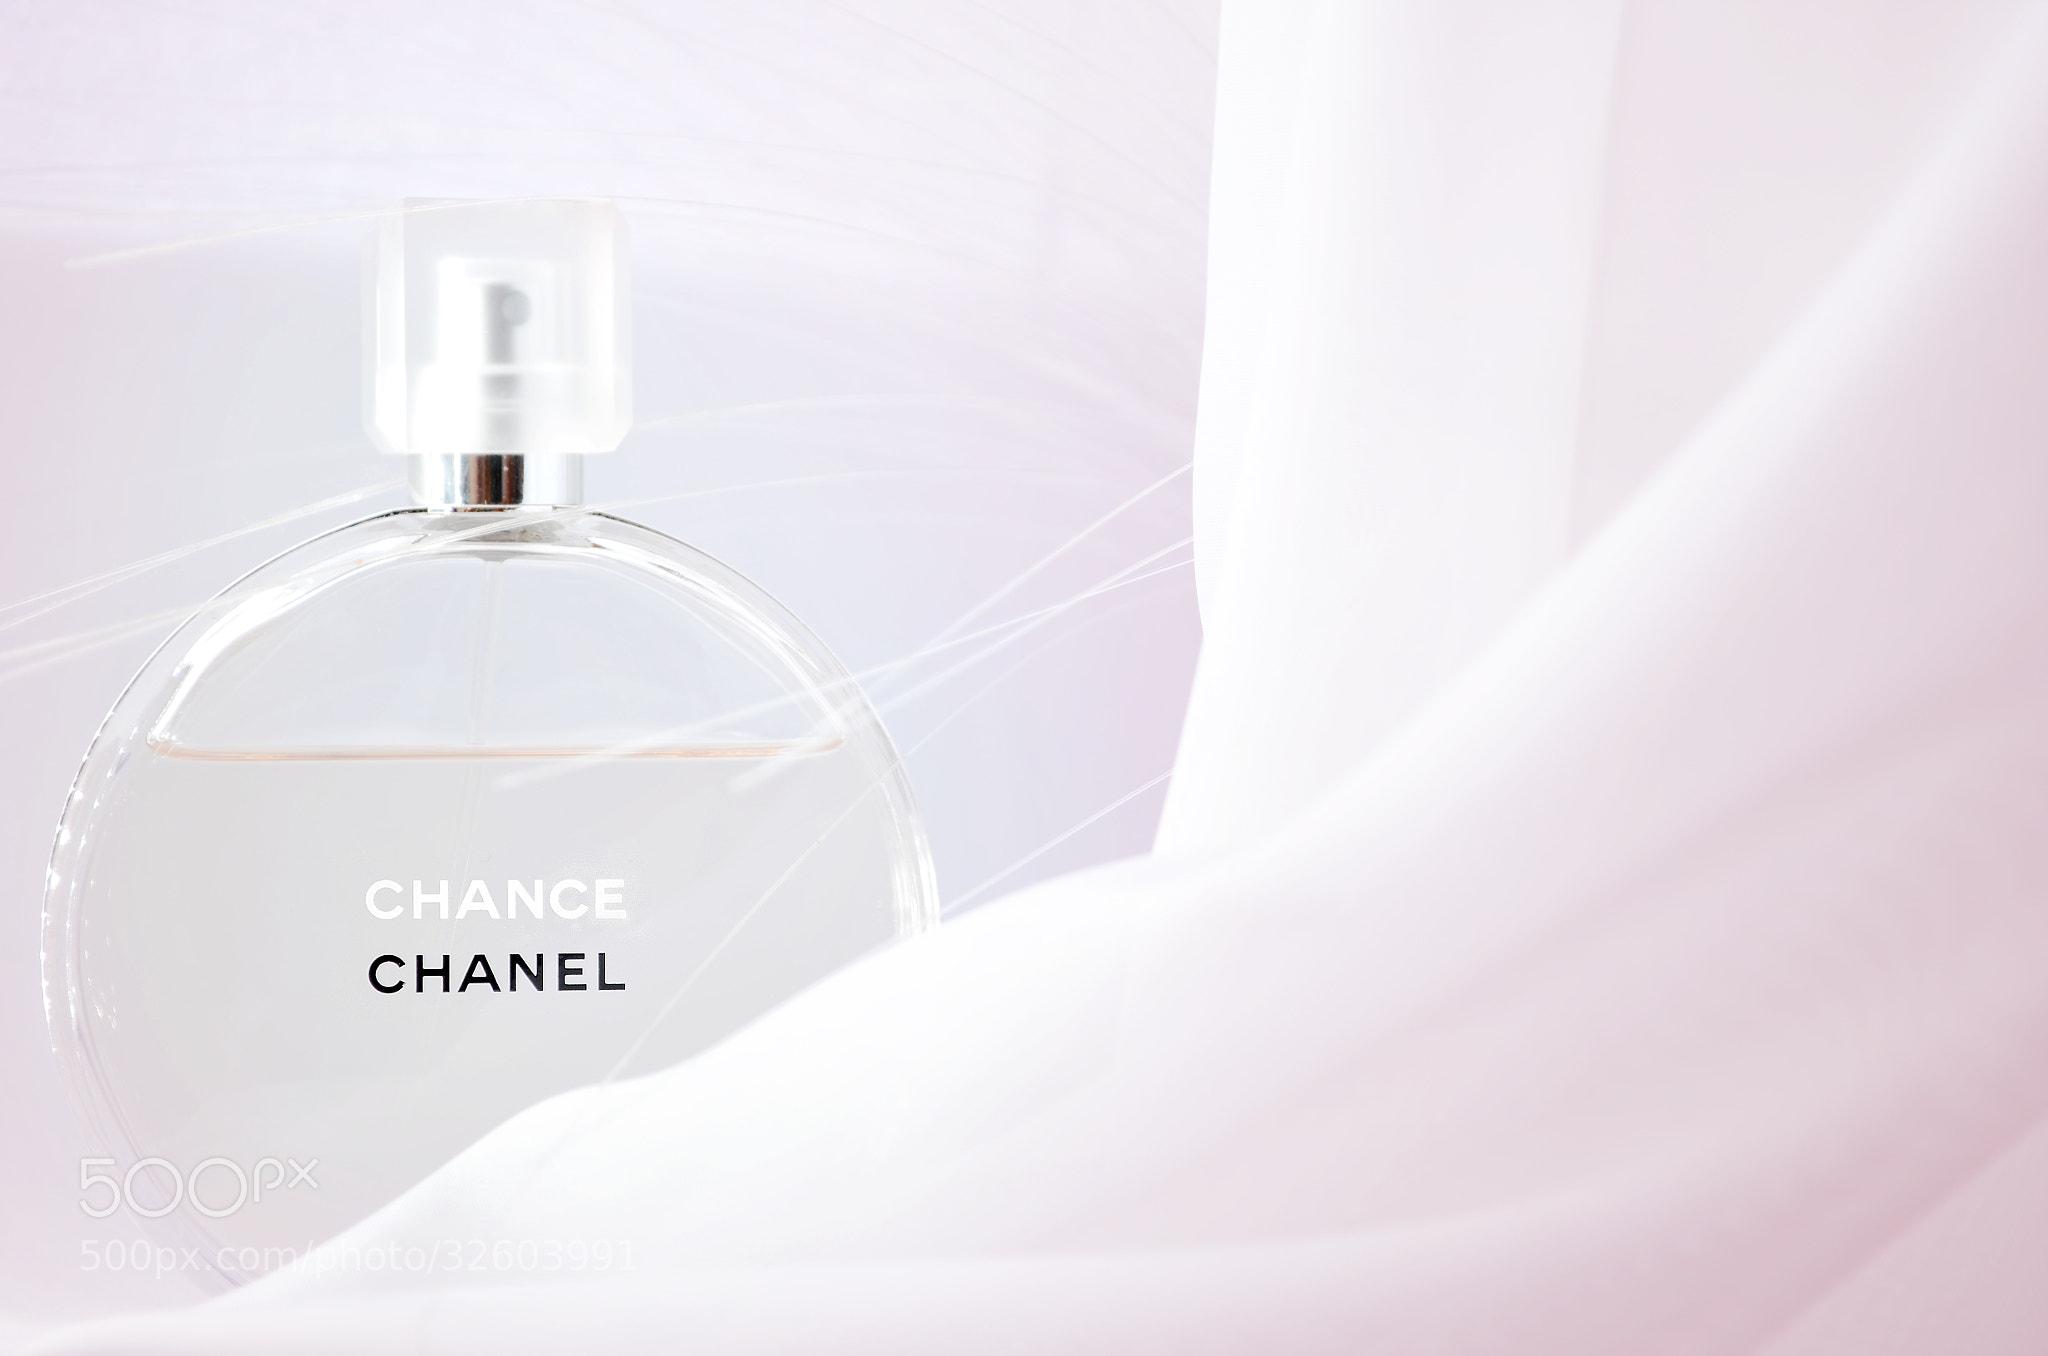 Photograph Chanel Chance by Margo Davidyan on 500px